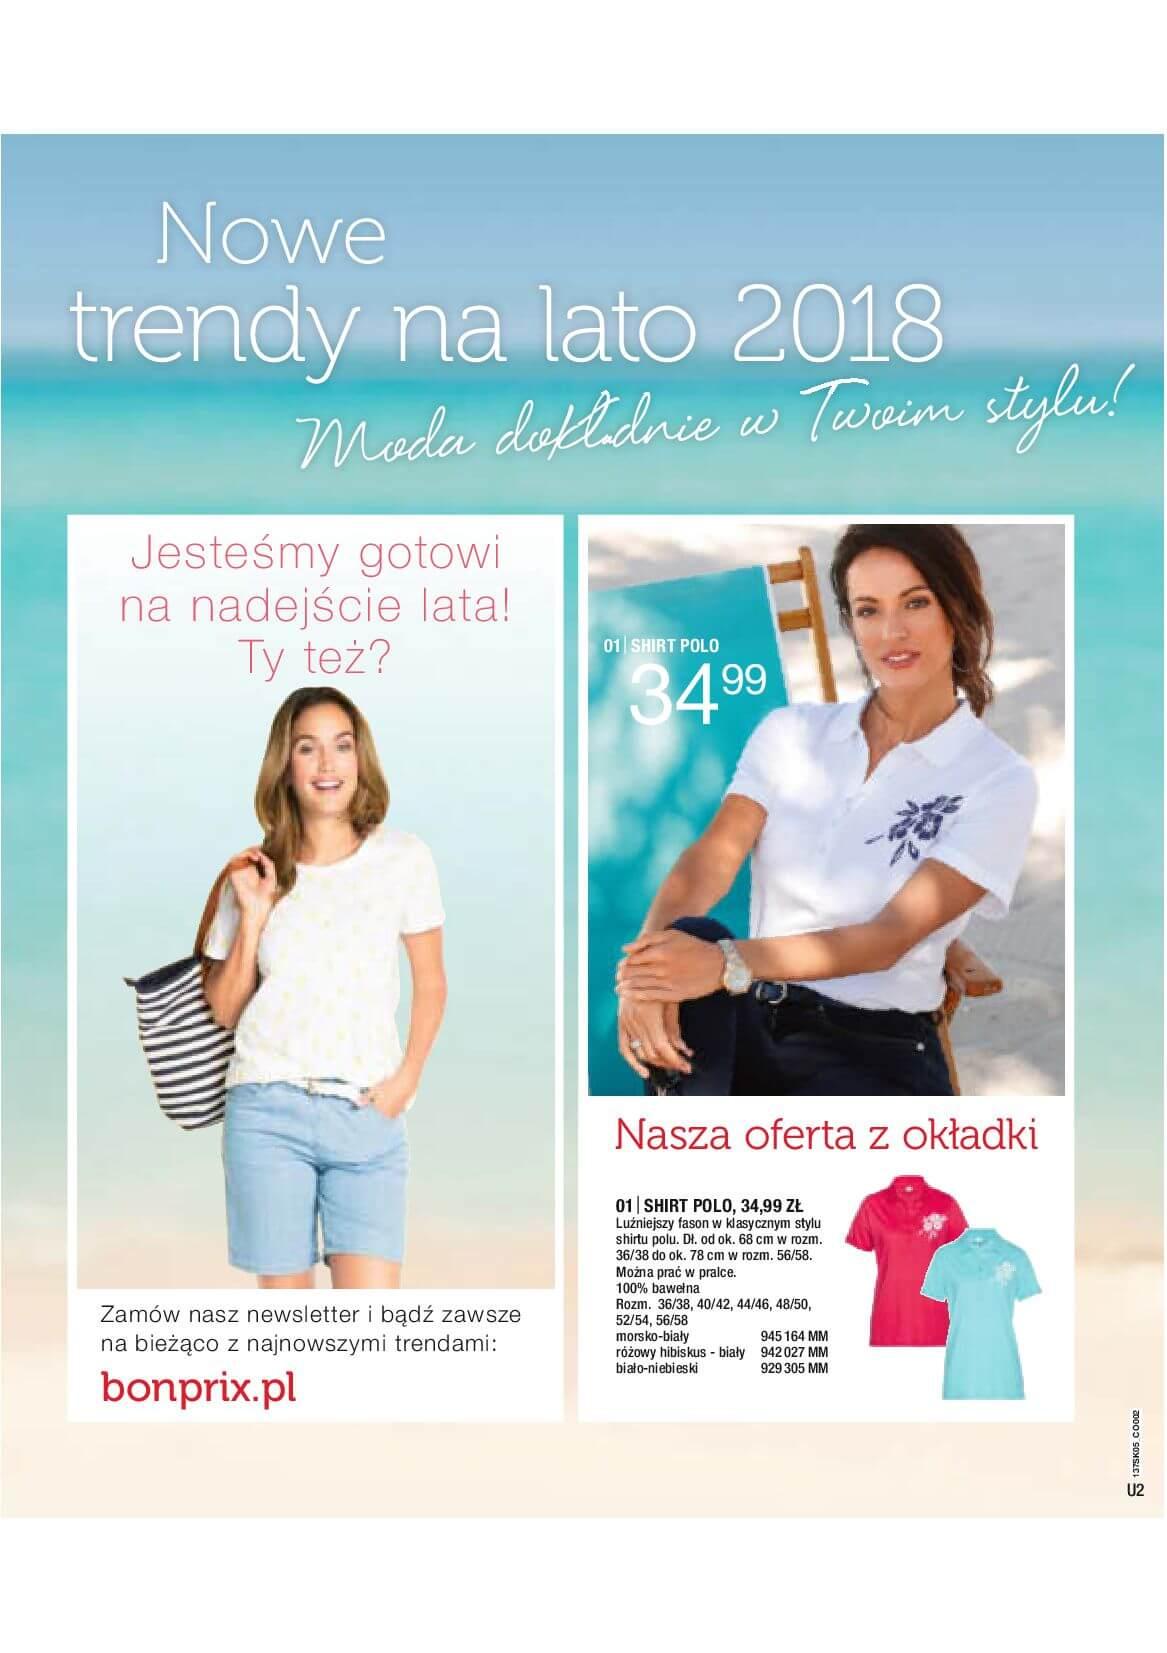 Gazetka Bonprix - Gotowi na lato-22.05.2018-22.11.2018-page-